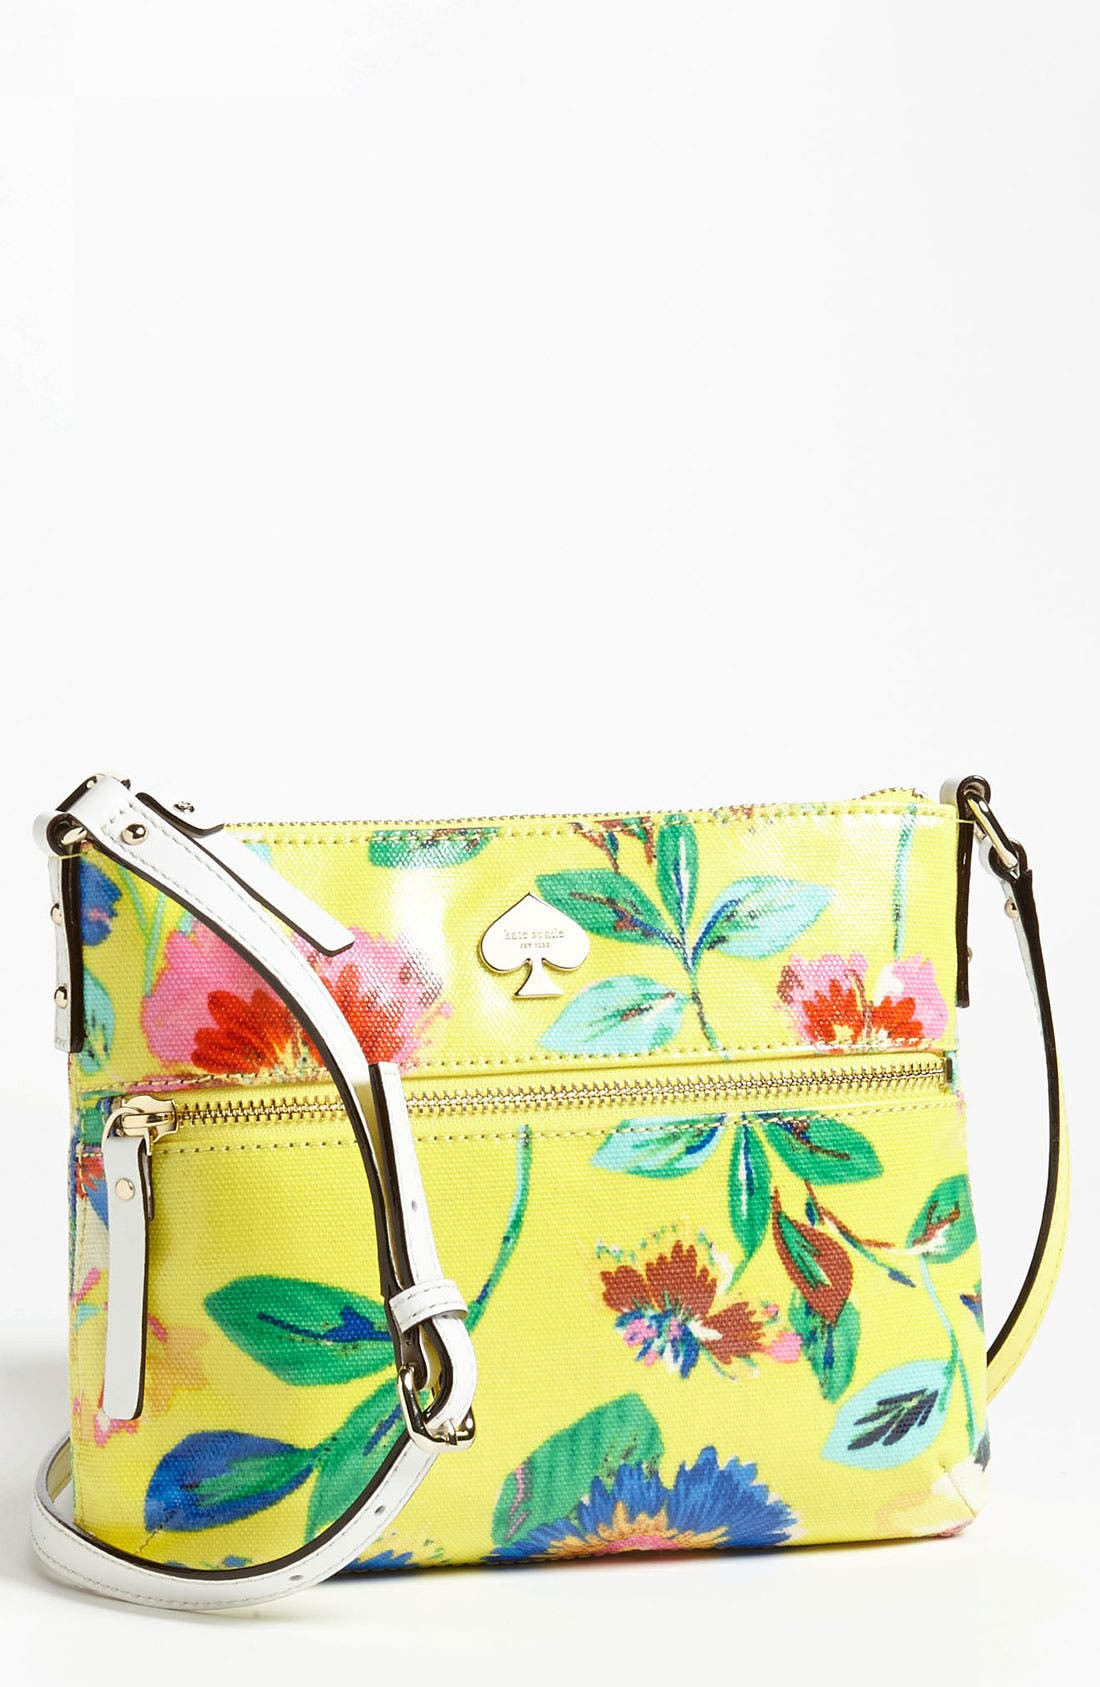 Main Image - kate spade new york 'flicker - tenley' crossbody bag